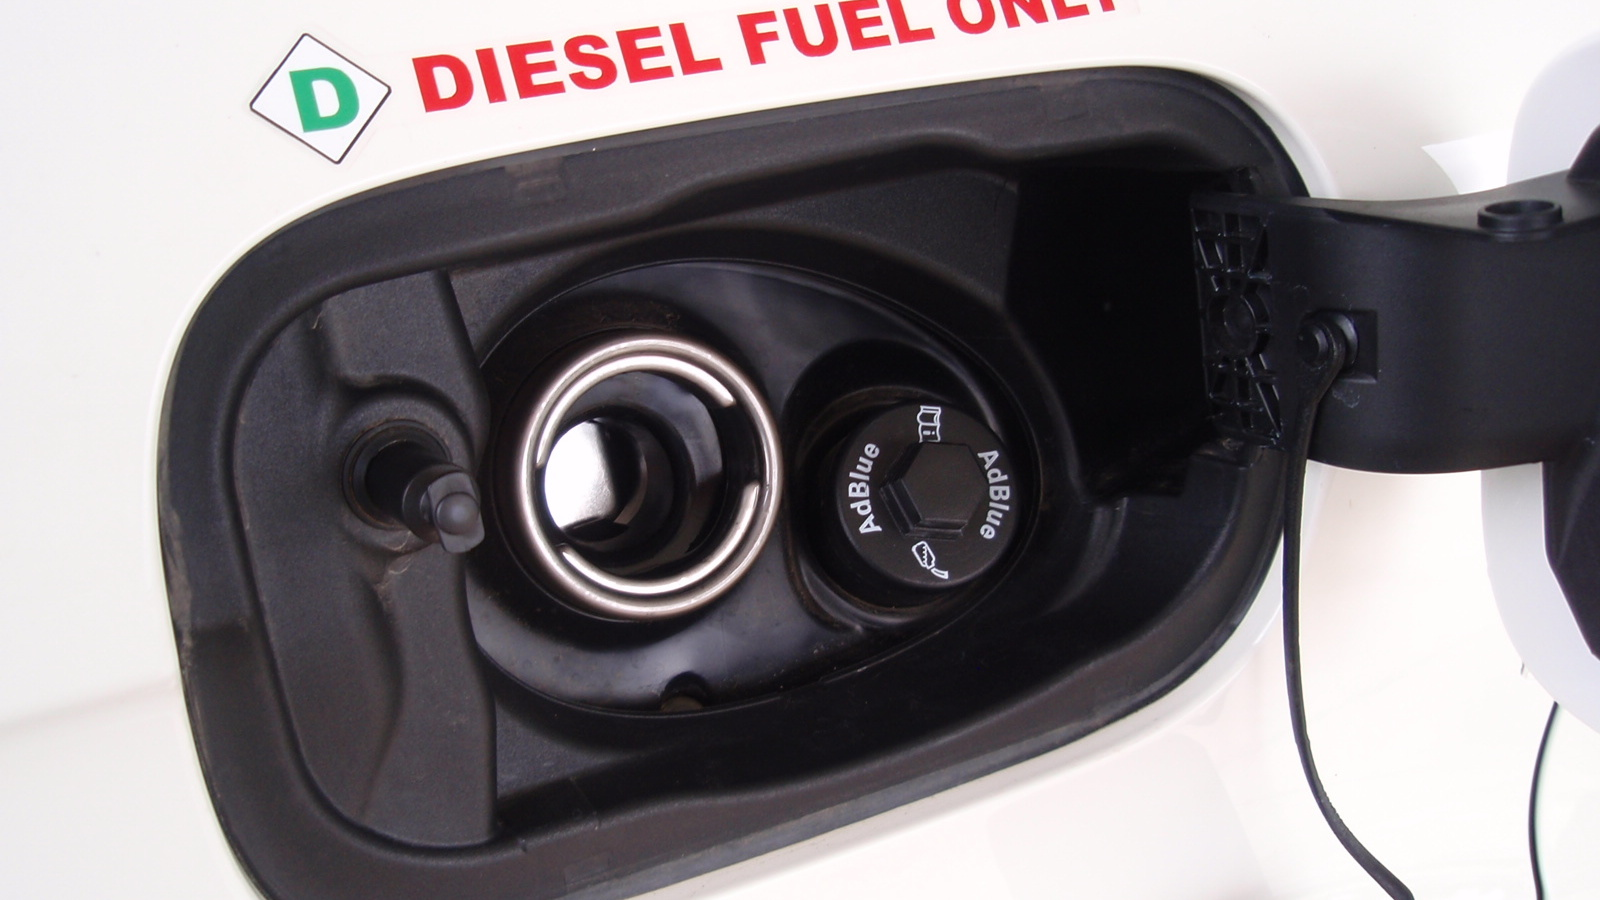 'Diesel fuel only' caution on Audi Q7 TDI